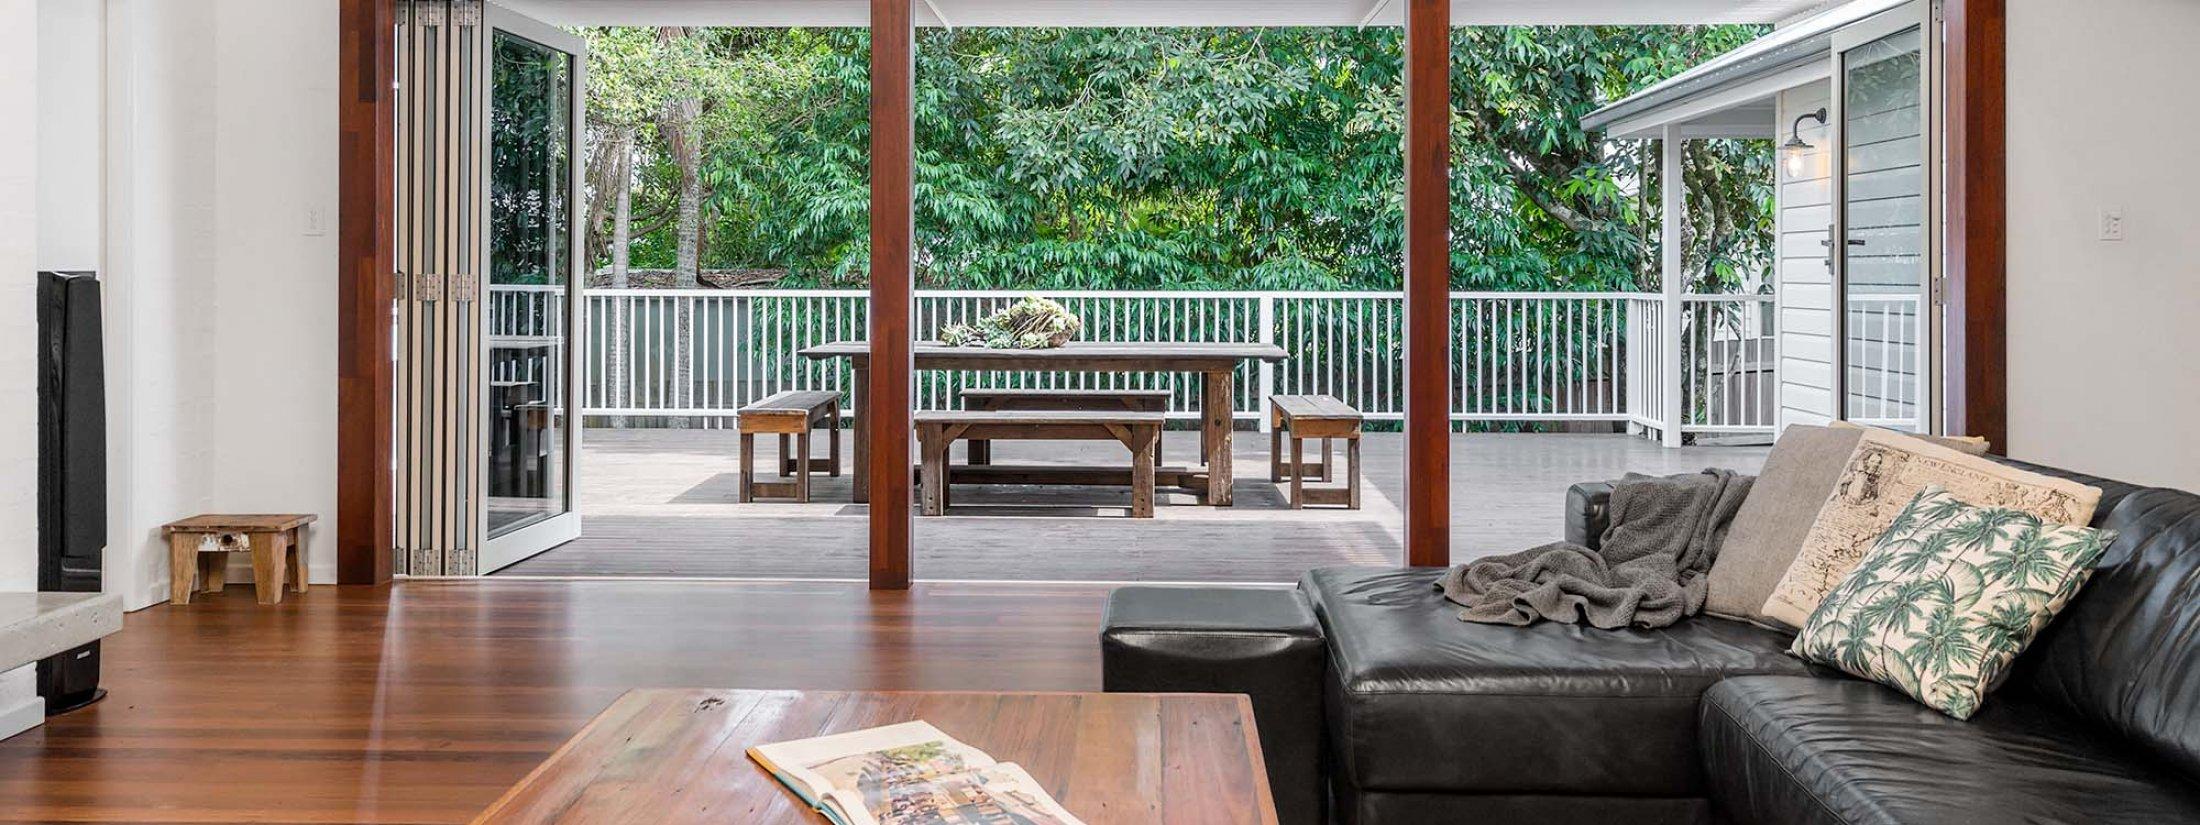 Cavvanbah Seaside Cottage - Byron Bay - Lounge towards outdoor setting